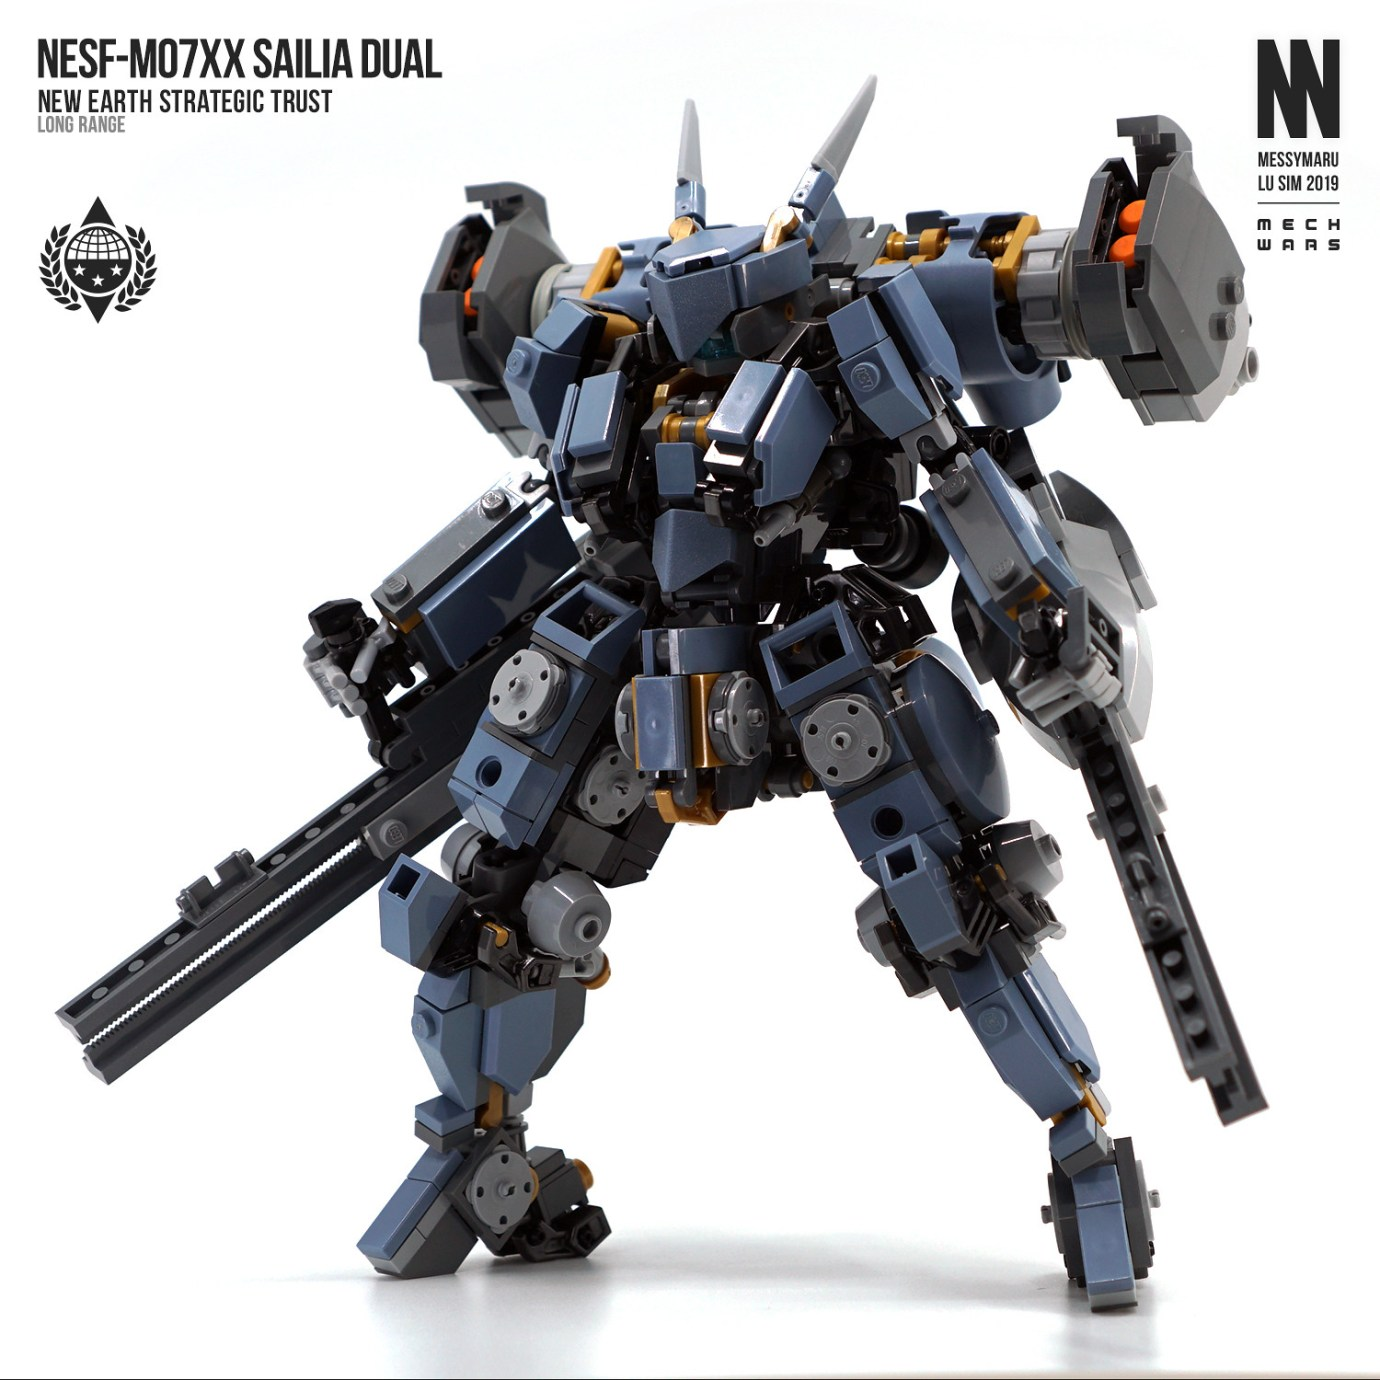 NESF-M07XX Sailia Dual